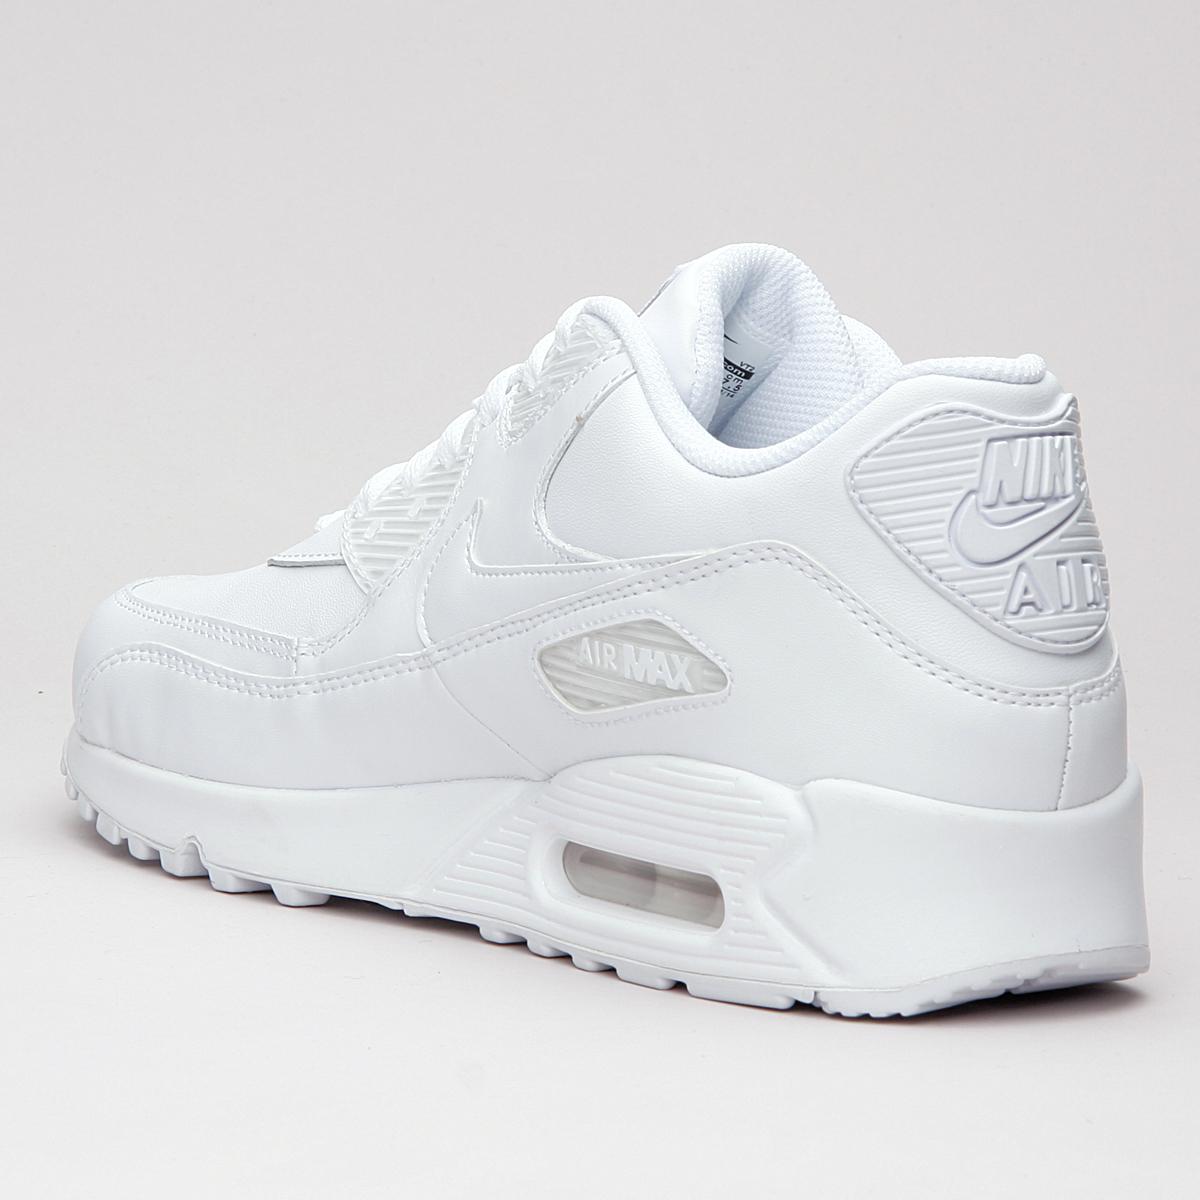 Nike Air Max 90 Leather TrwhtTrwht